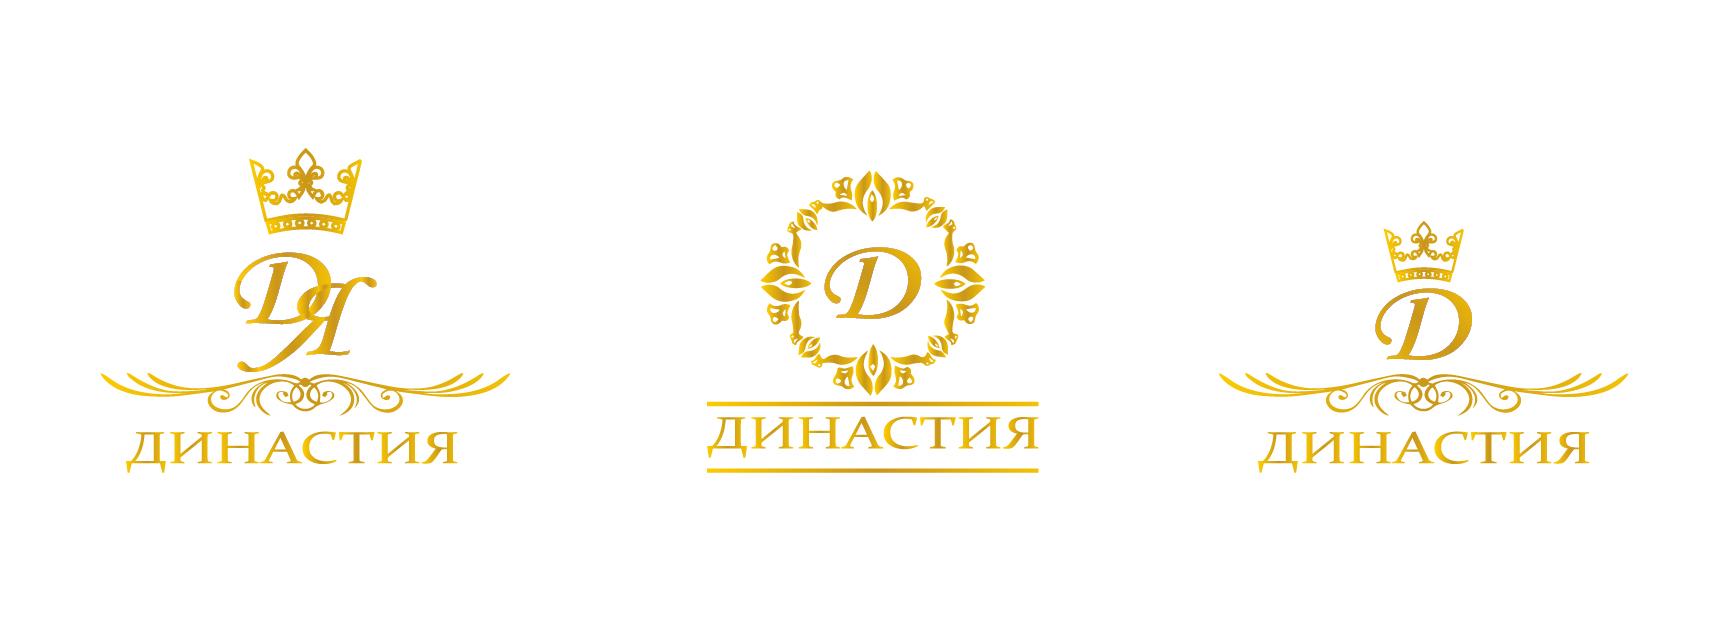 Разработать логотип для нового бренда фото f_08959e0a271e7180.jpg